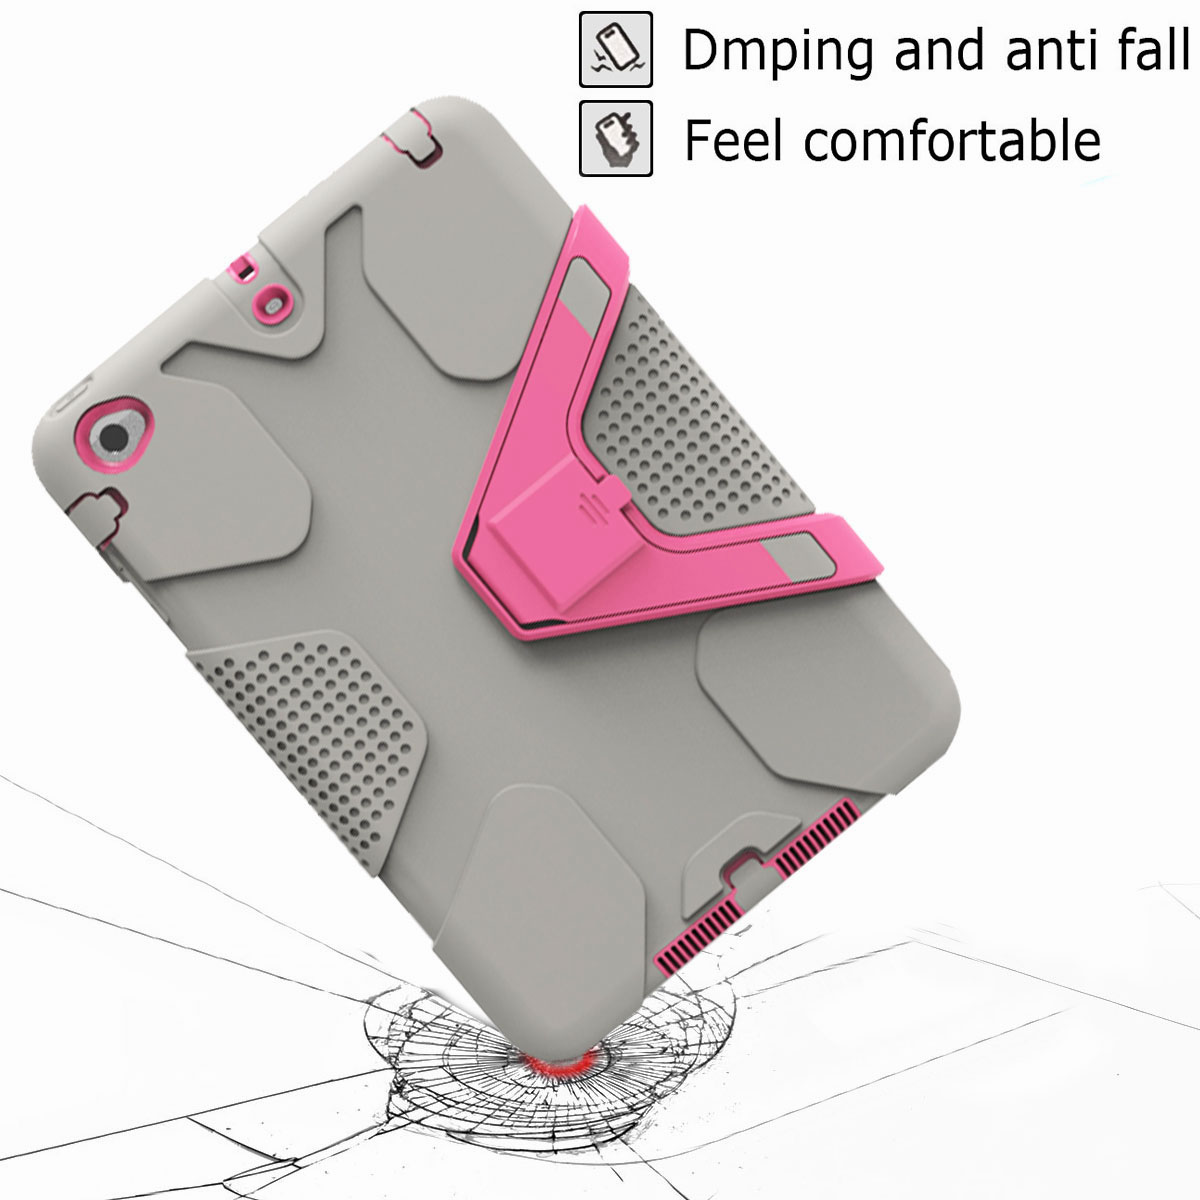 Luxury-Shockproof-Tough-Armor-with-Hard-Kickstand-Case-For-Apple-iPad-Mini-1-2-3 thumbnail 31